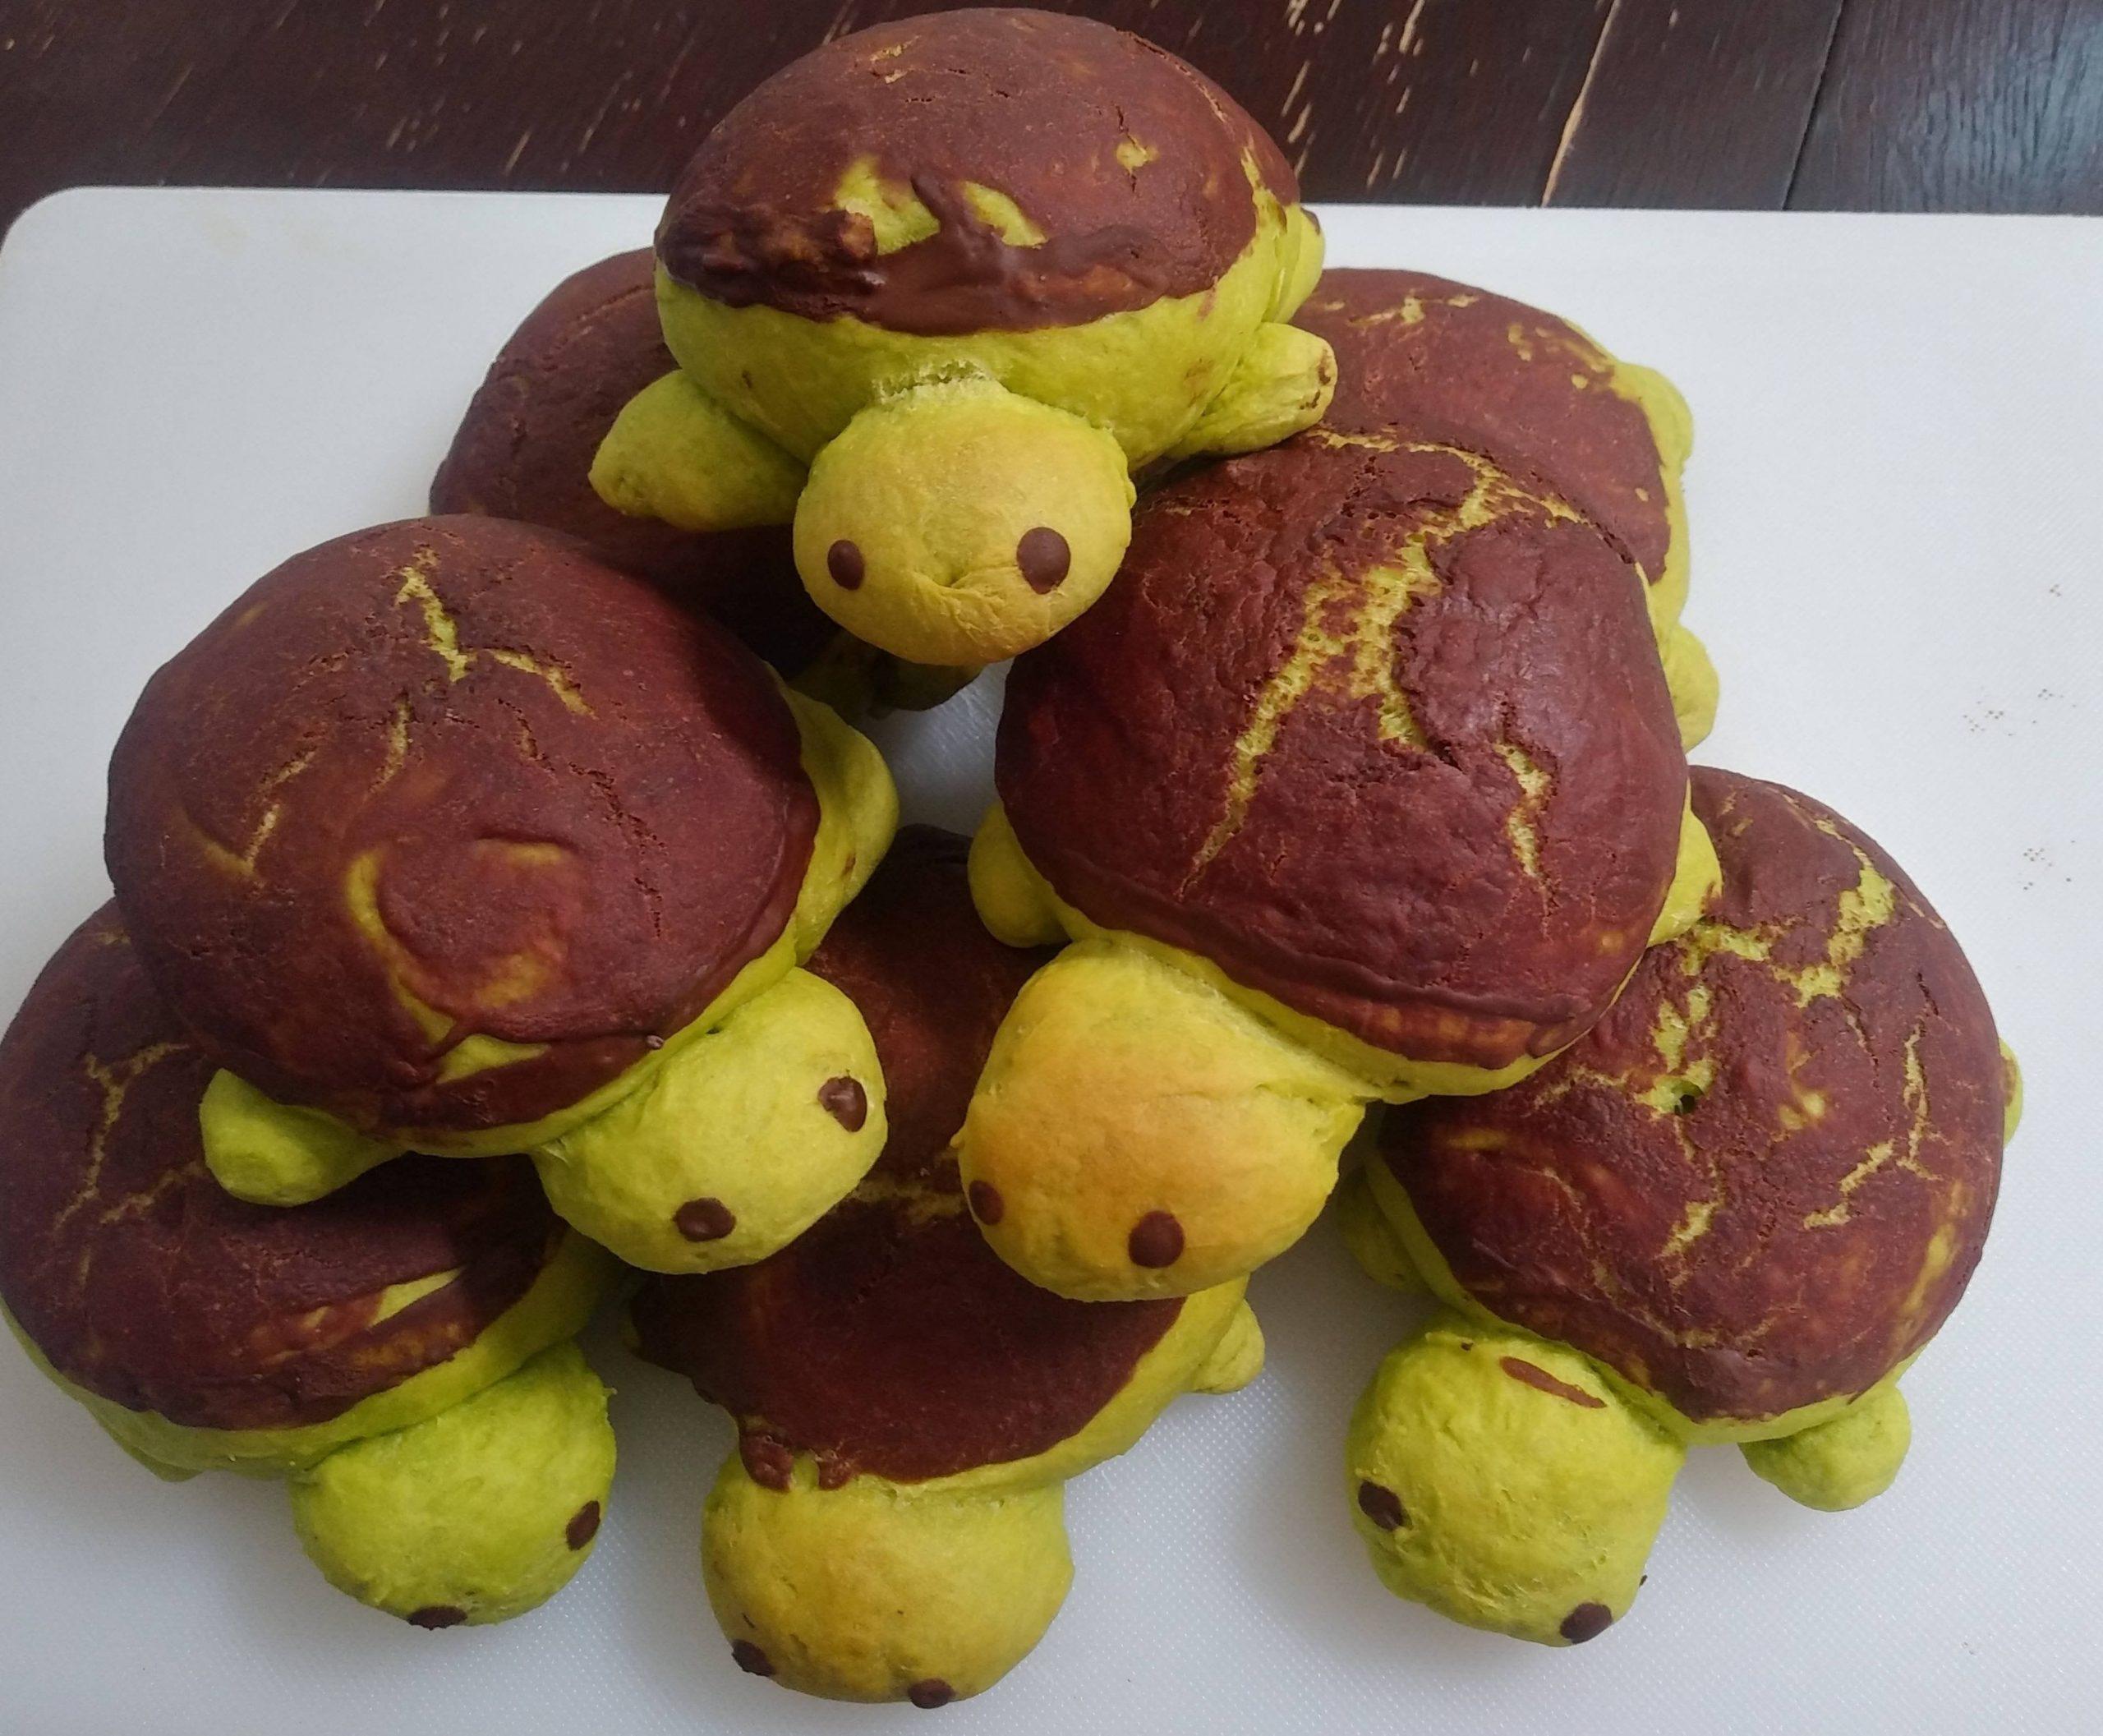 IbWWFRVThPLBMtxwVkQKnAwMhkZZrwybiyBameiEYp8 scaled - Does baking count? I'm so proud of these sweet bun turtles! - hobbies, crafts